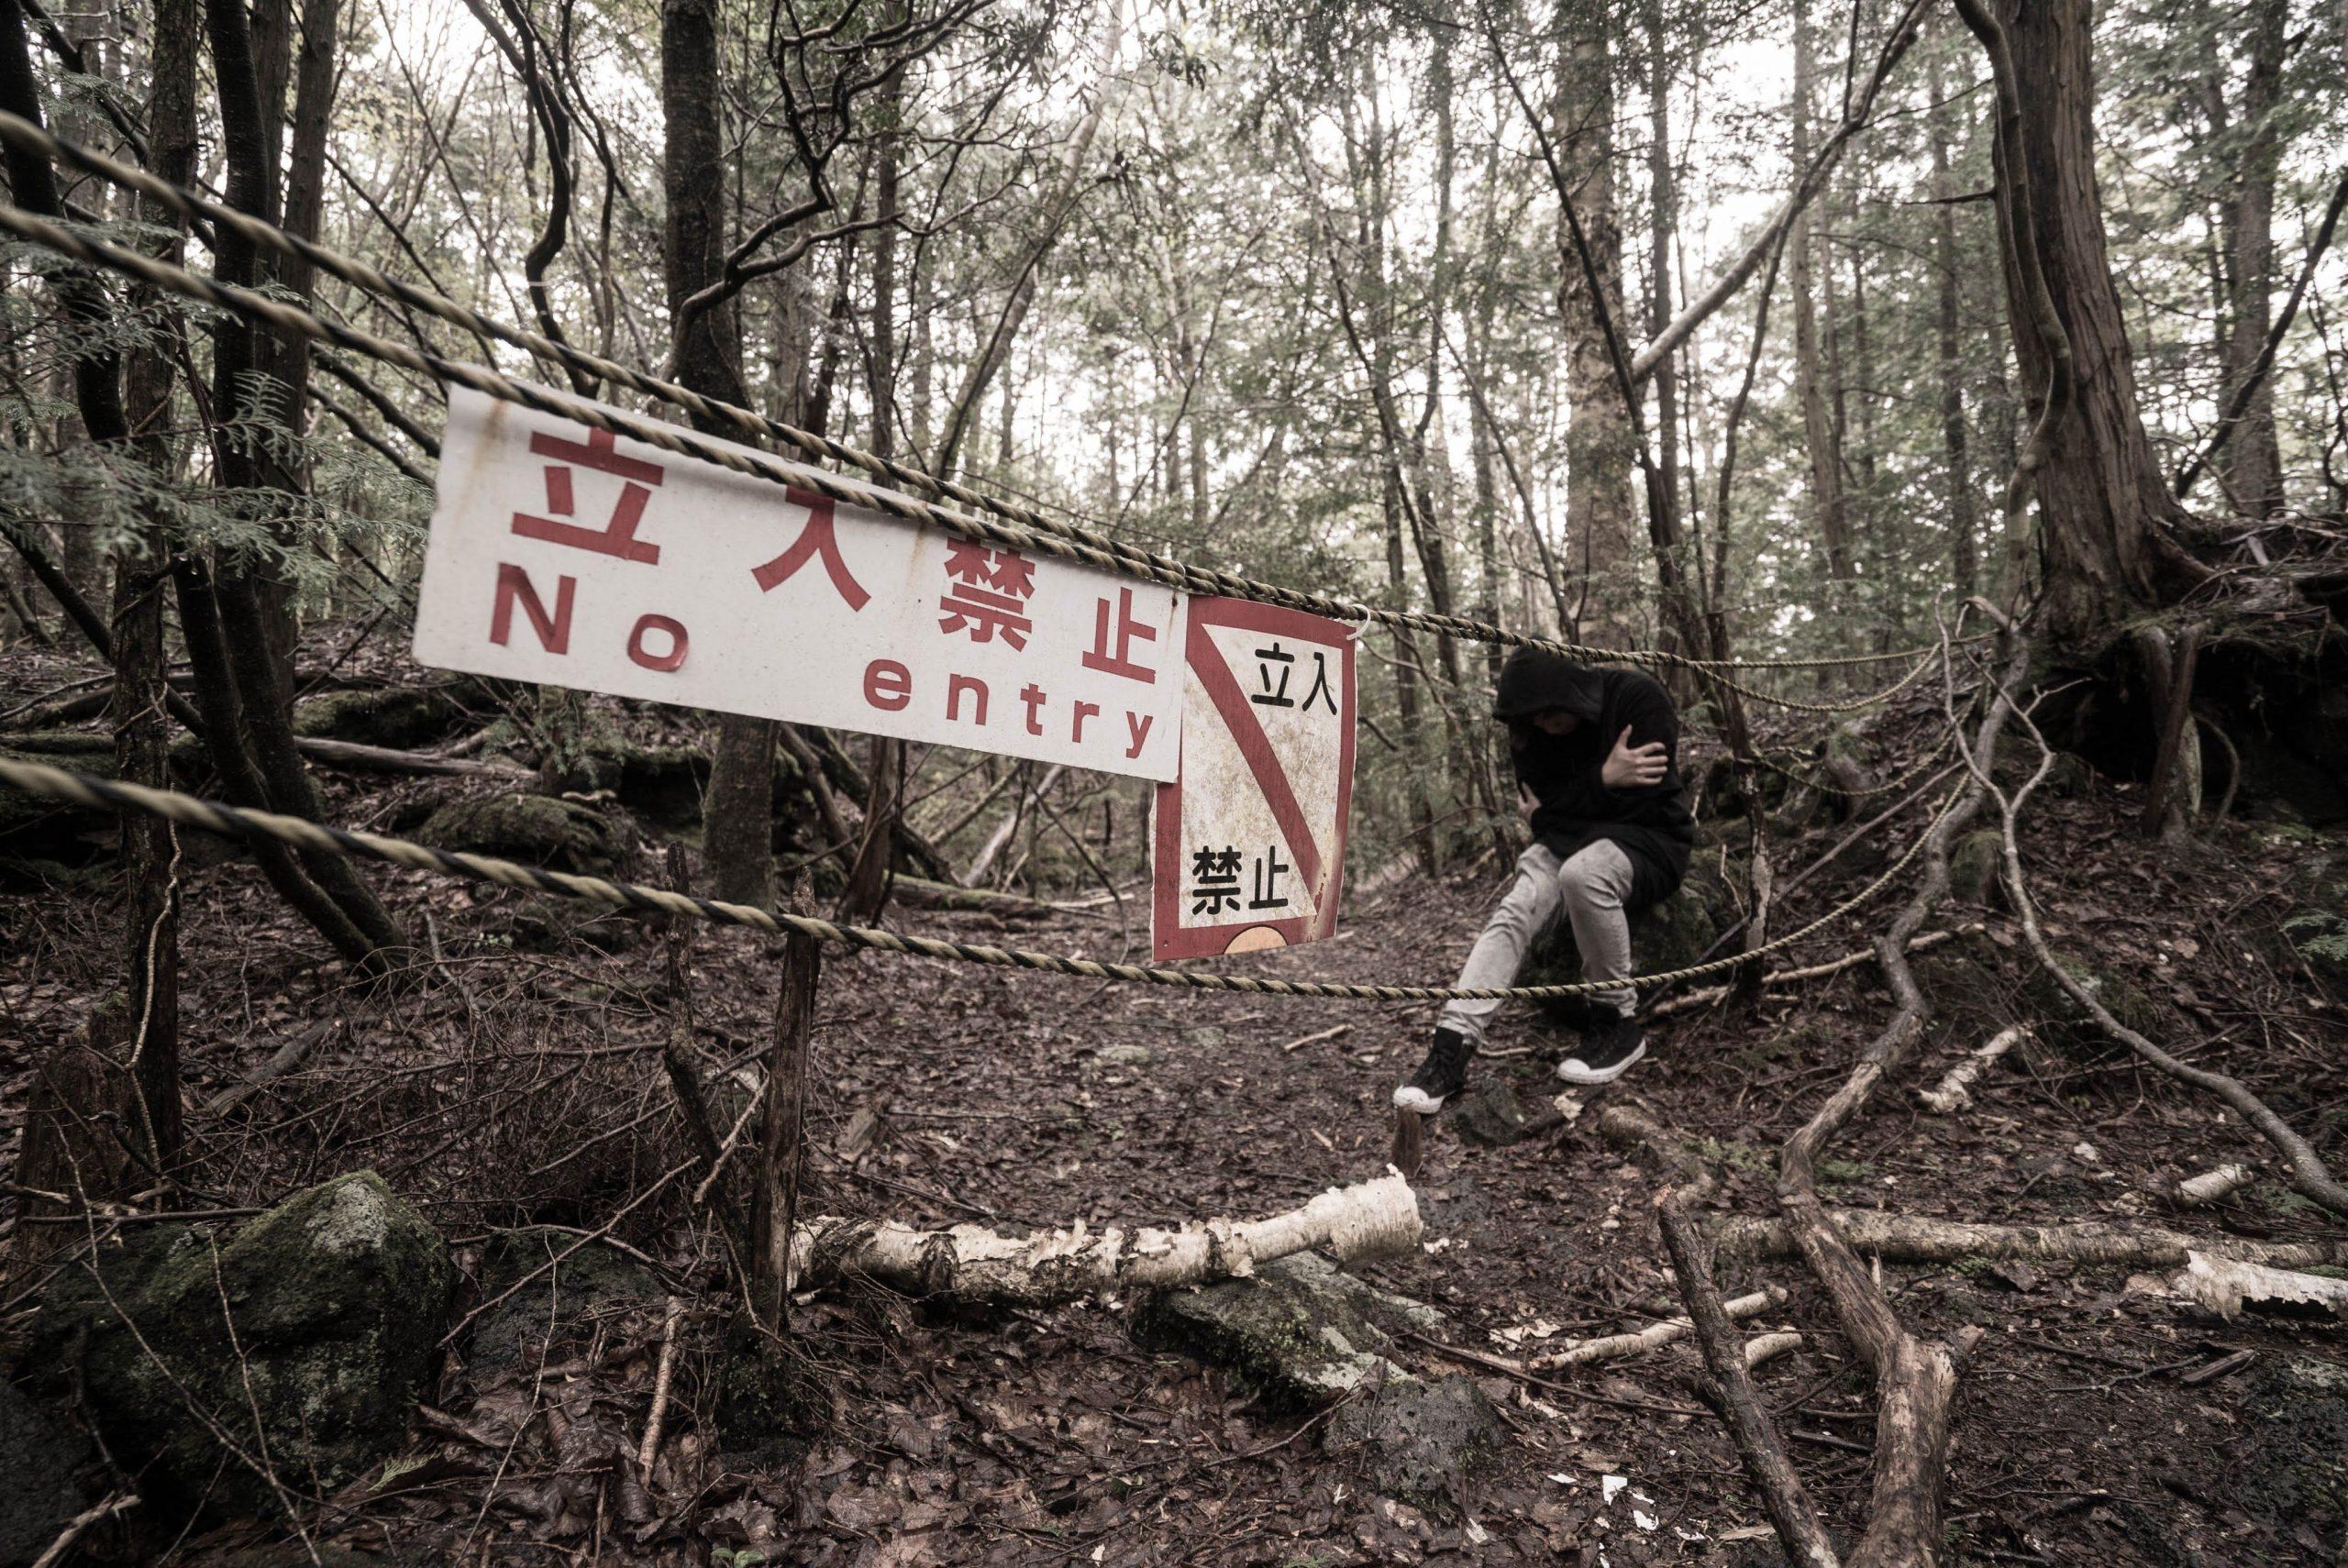 5 Hutan Terseram Di Dunia